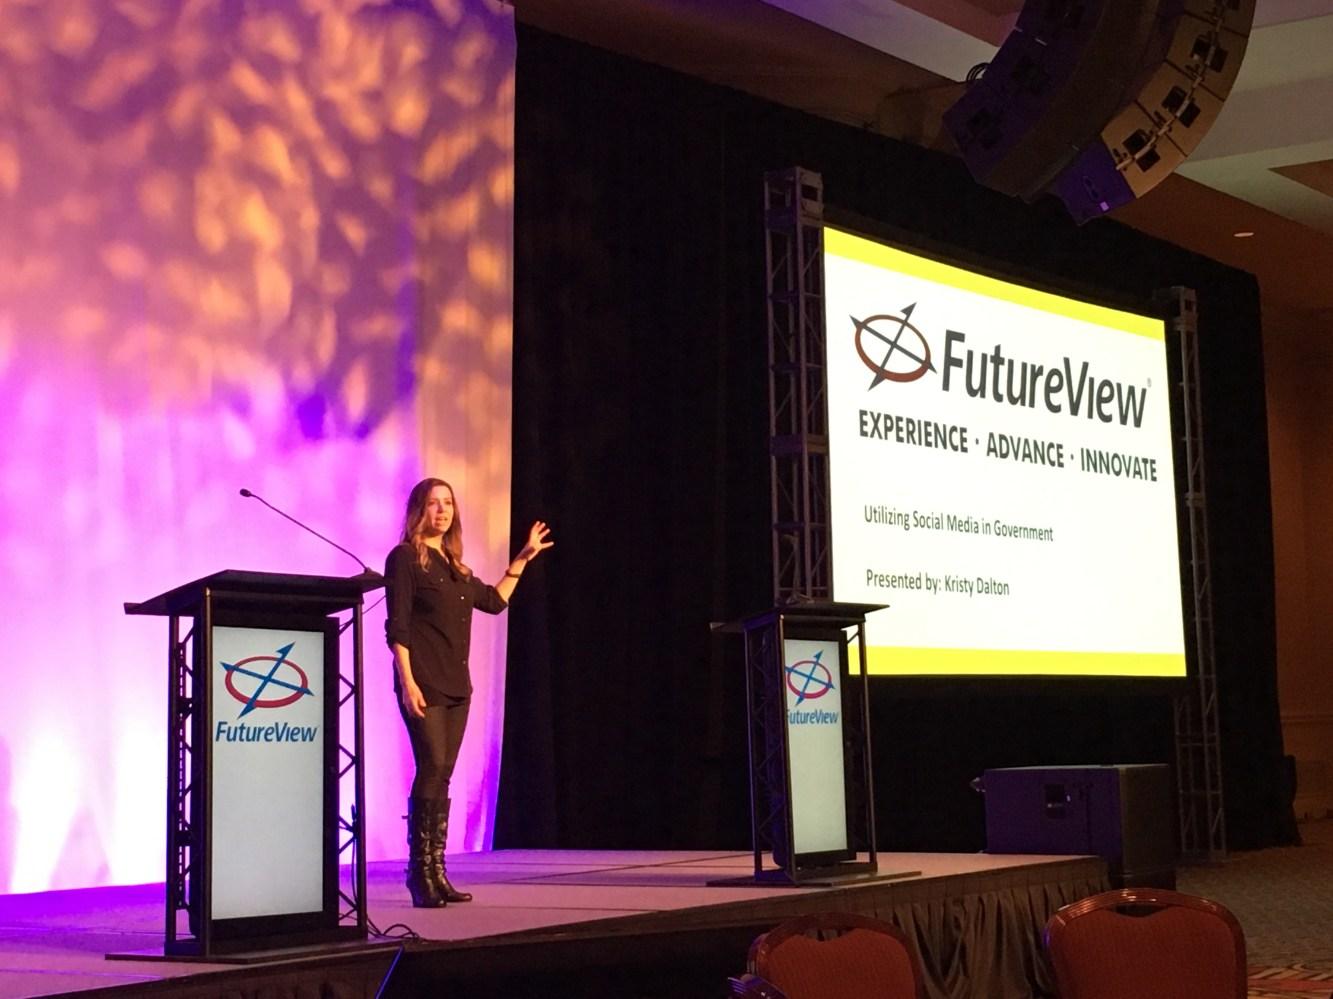 Kristy Dalton, a.k.a. GovGirl, talks social media strategy for government agencies at FutureView 2017.